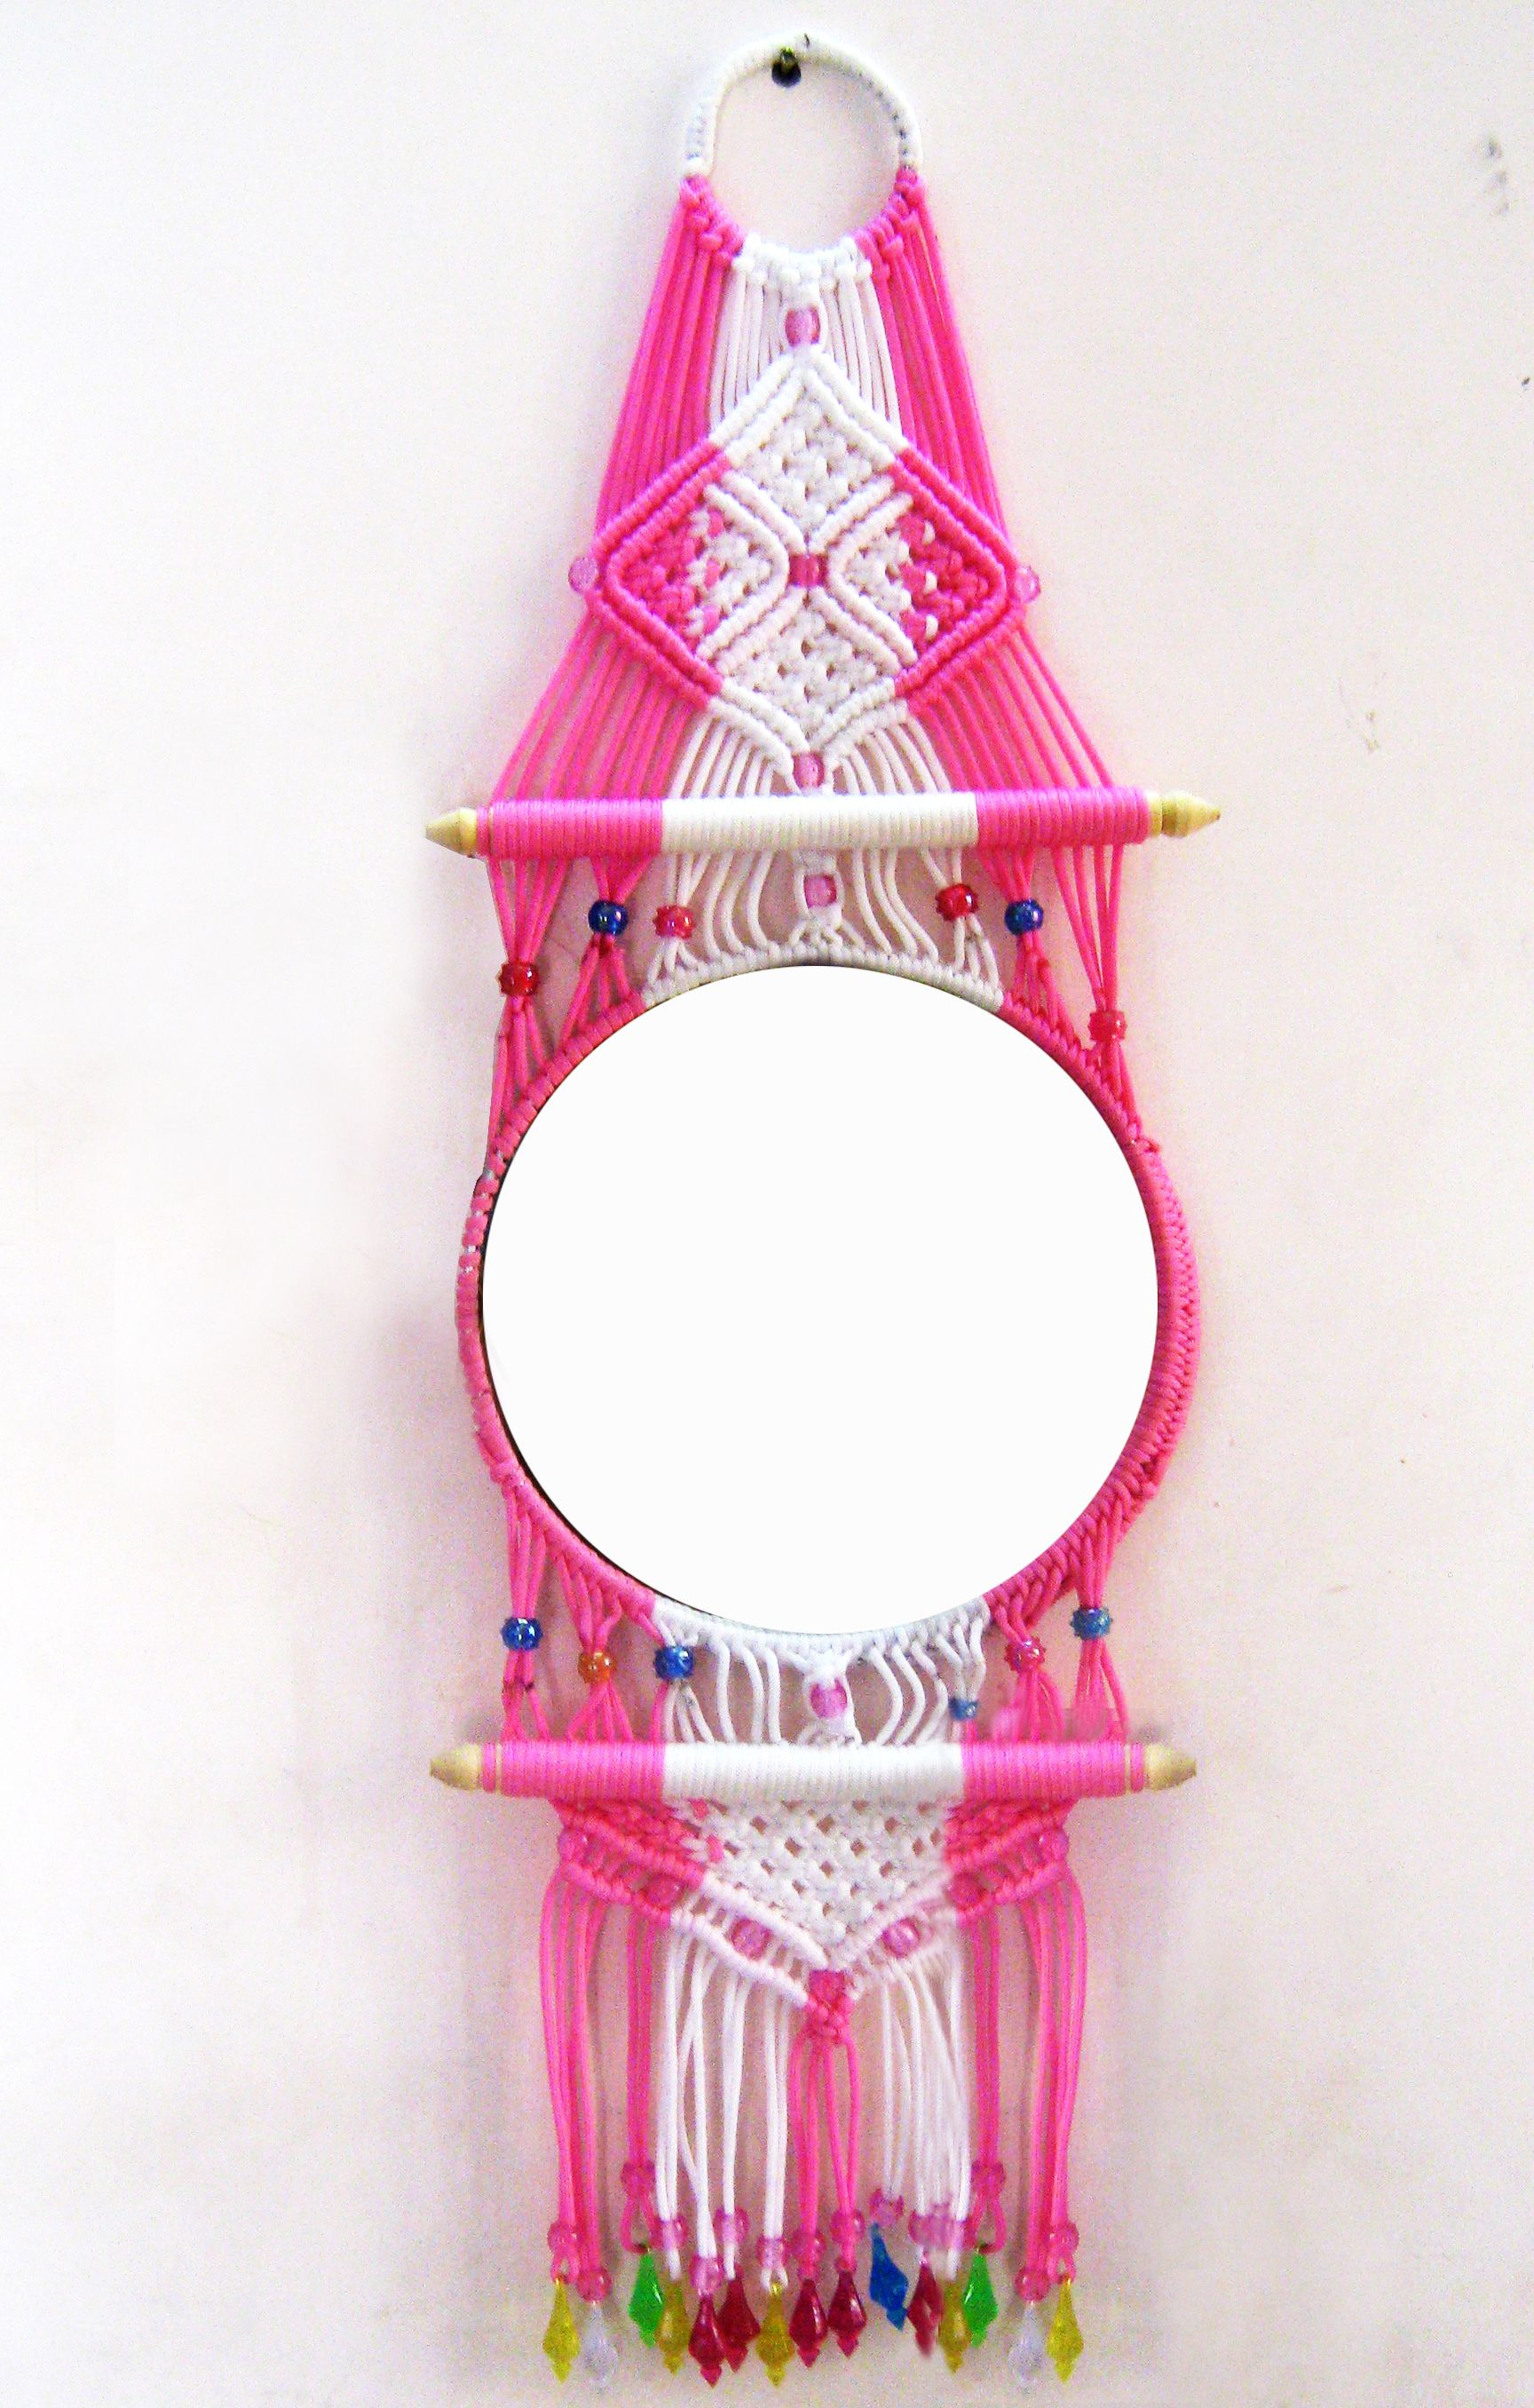 Popular Youtube Design Star Html Html Html Html Html Html Html - Http www shopclues com macrame decorative mirror